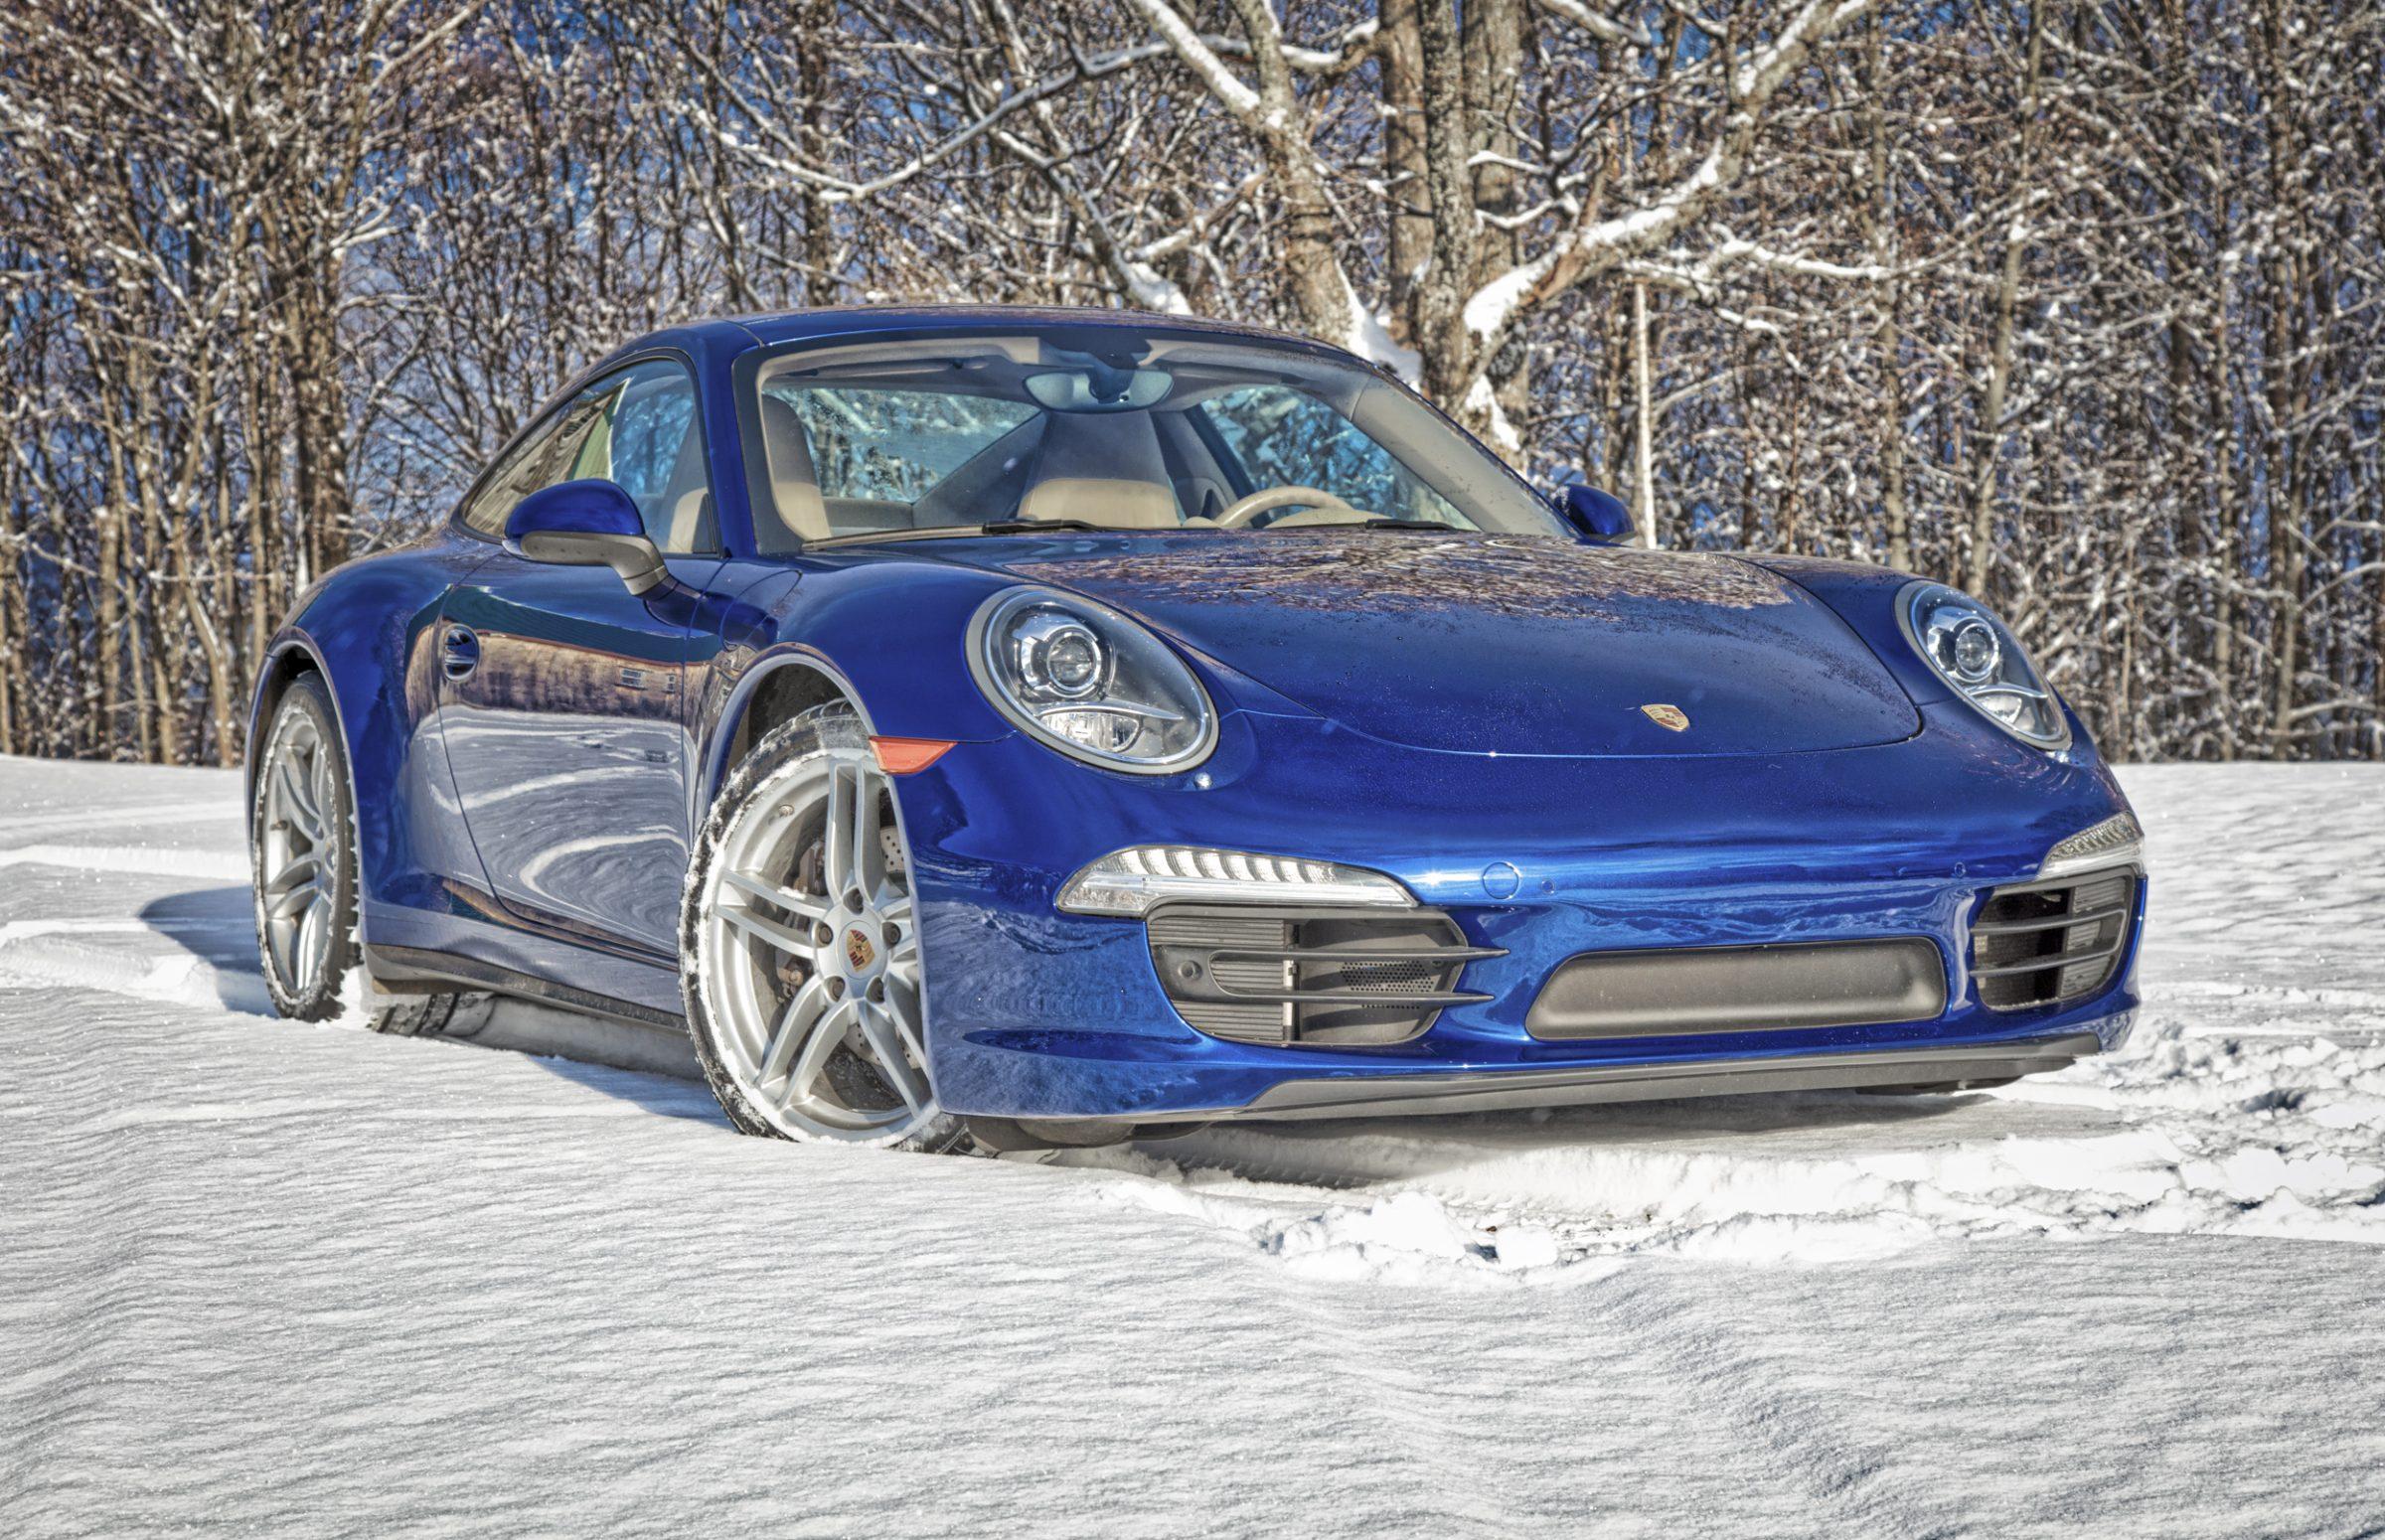 Herb Chambers Porsche >> Winter Warmer 2020 – NER – Northeast Region of the Porsche Club of America